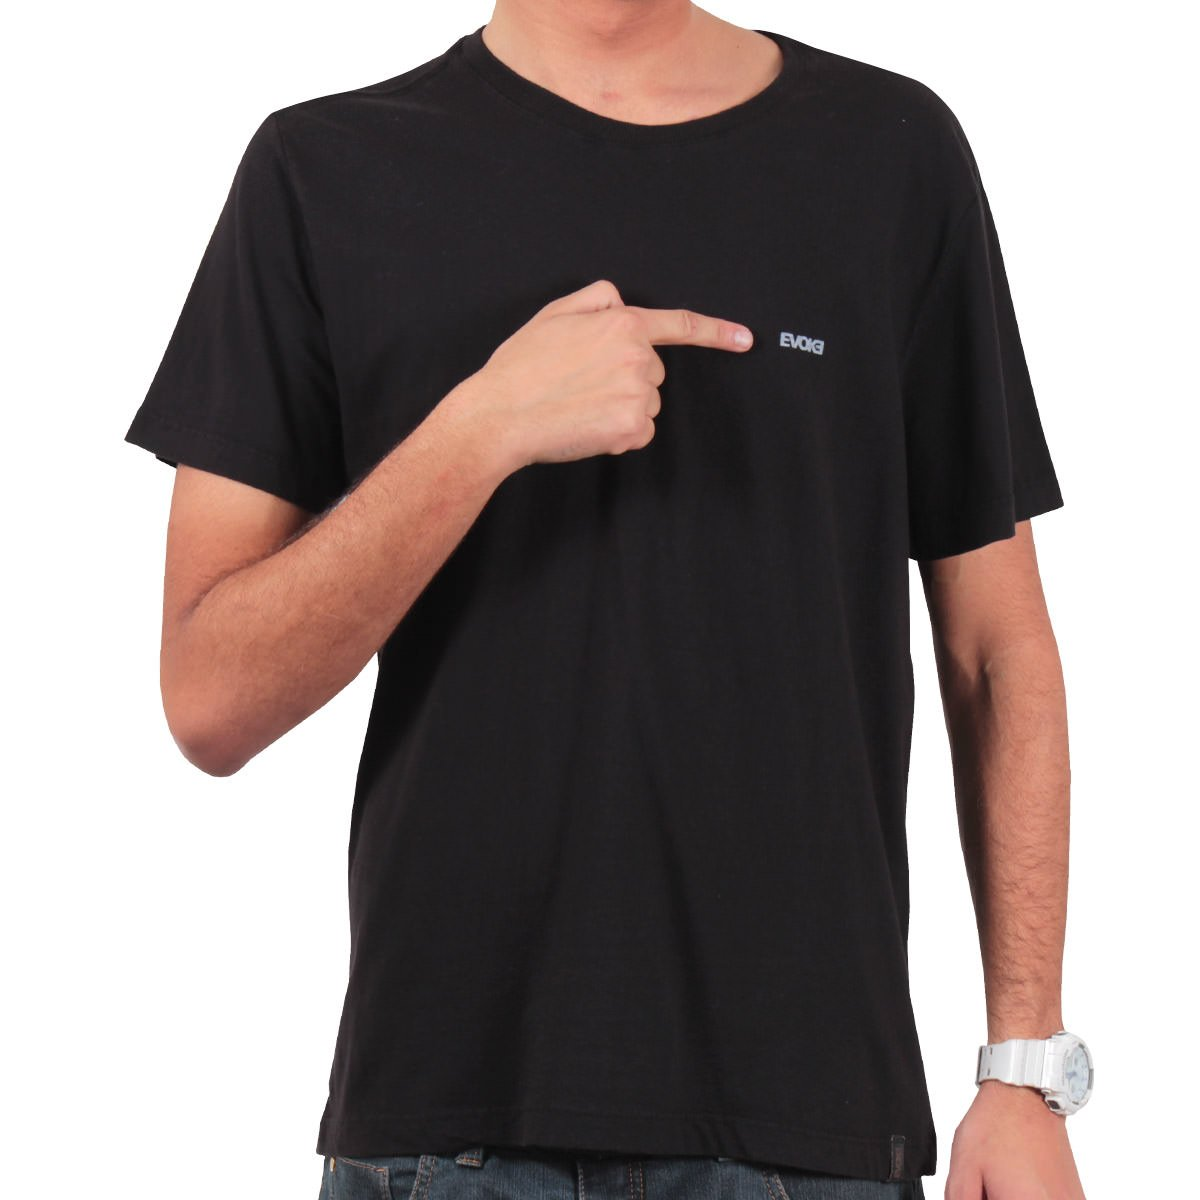 7bdbb1eef2523 Camiseta Evoke Skull Rose Preto - Rock City